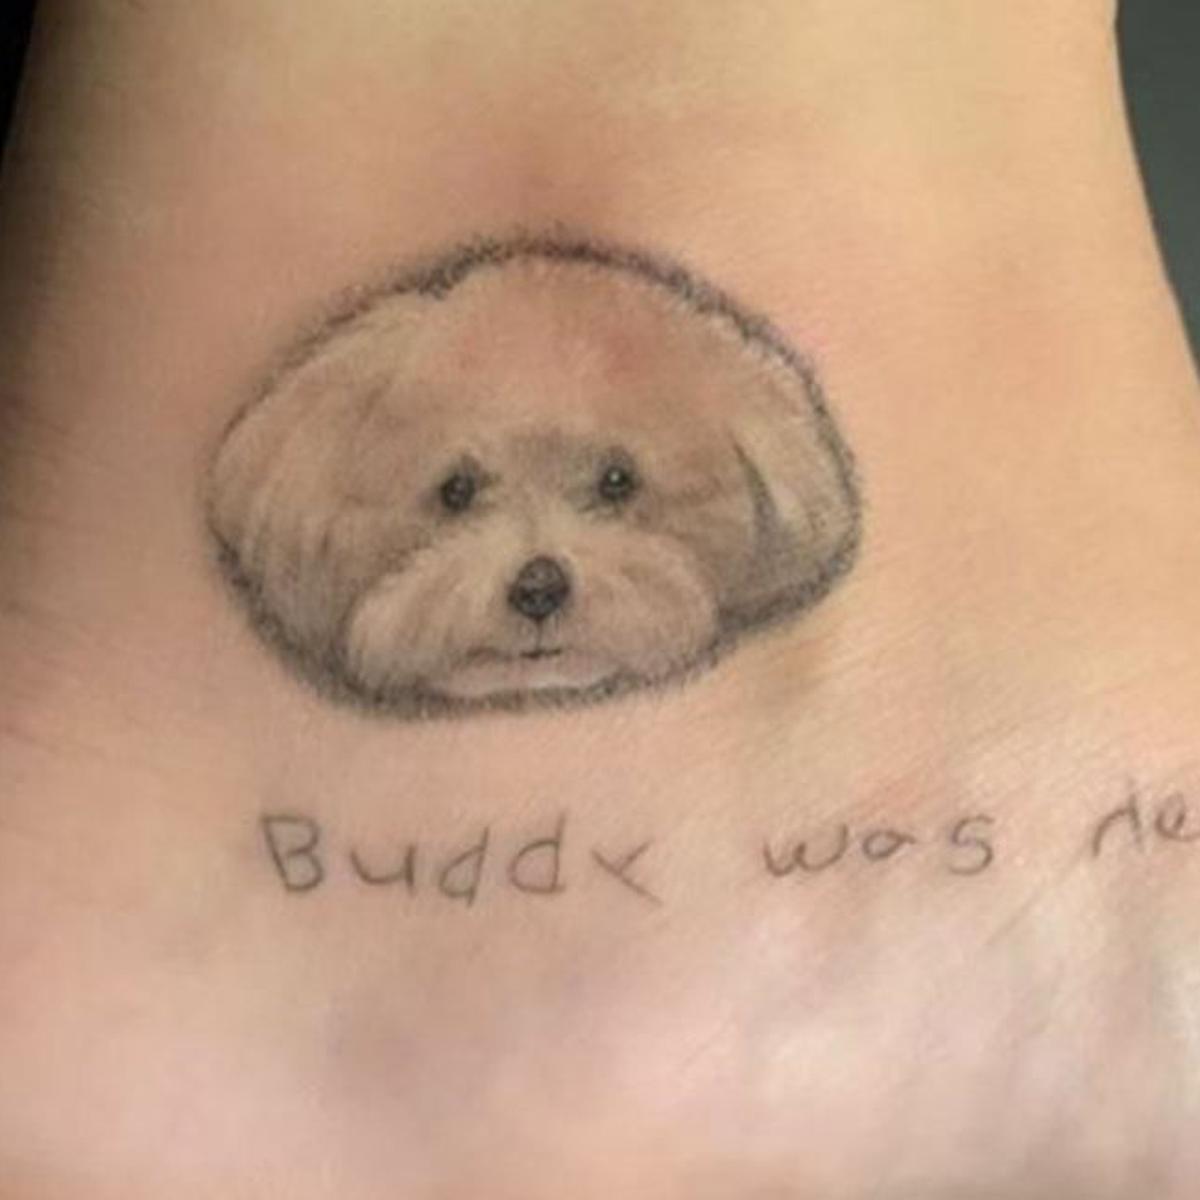 Demi Lovato S Tattoo Tribute To Dog Buddy Celebrities Celebretainment Com